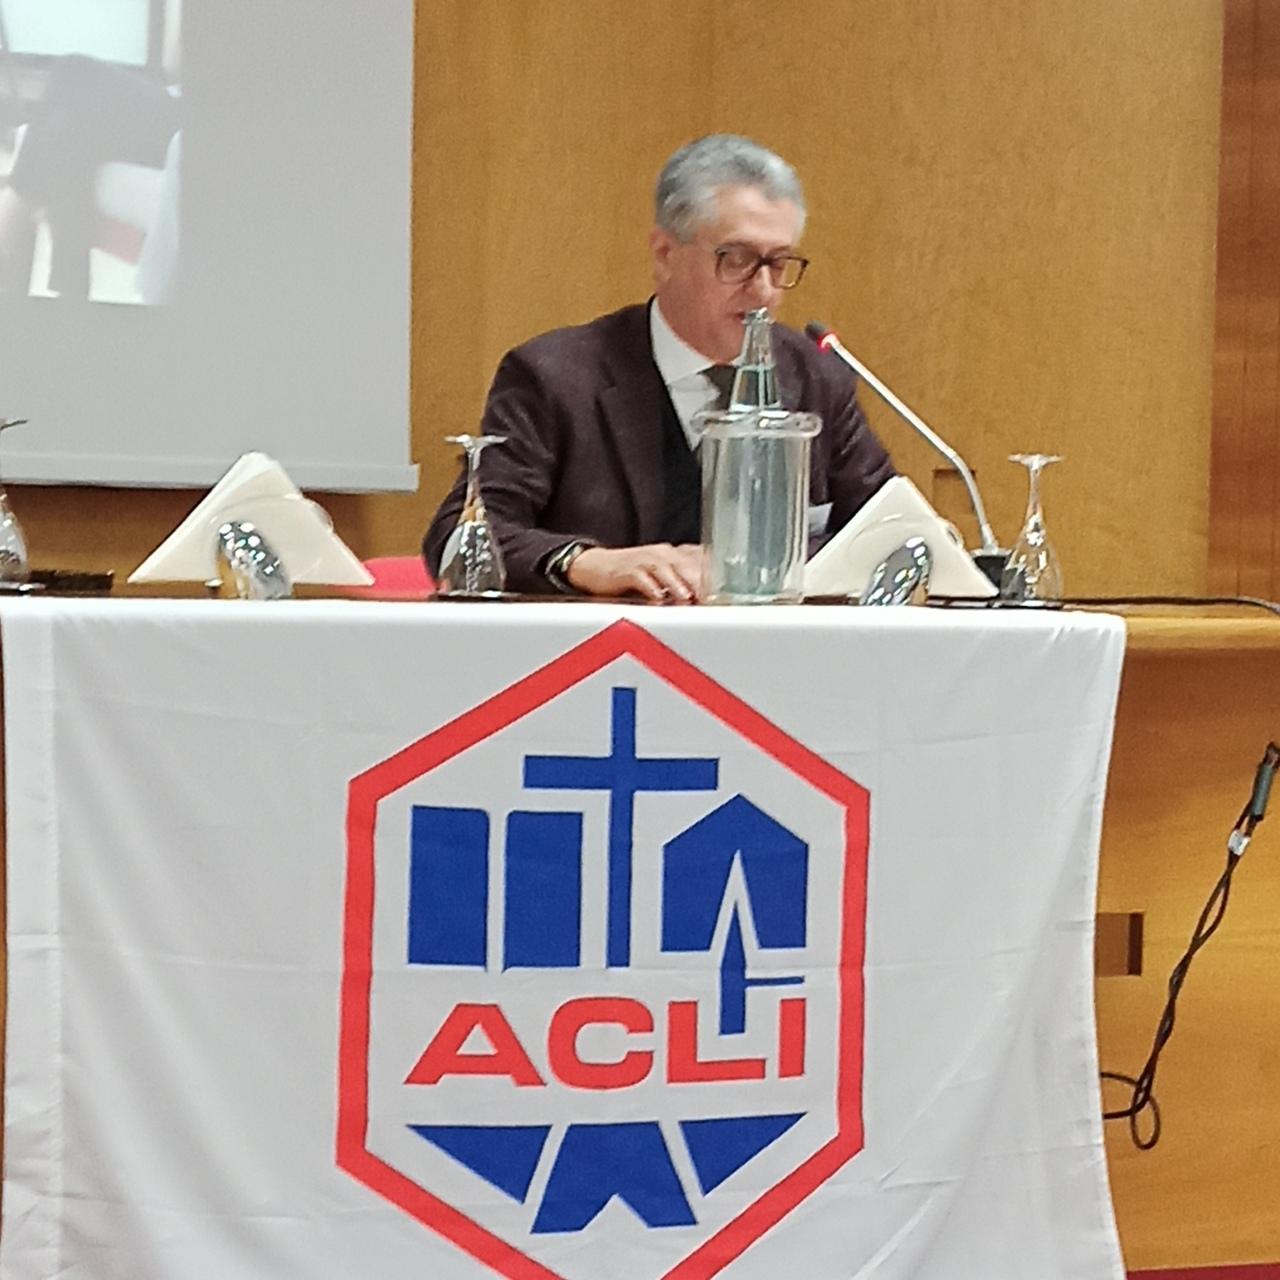 XXVII° Congresso Acli Latina: MaurizioScarsella